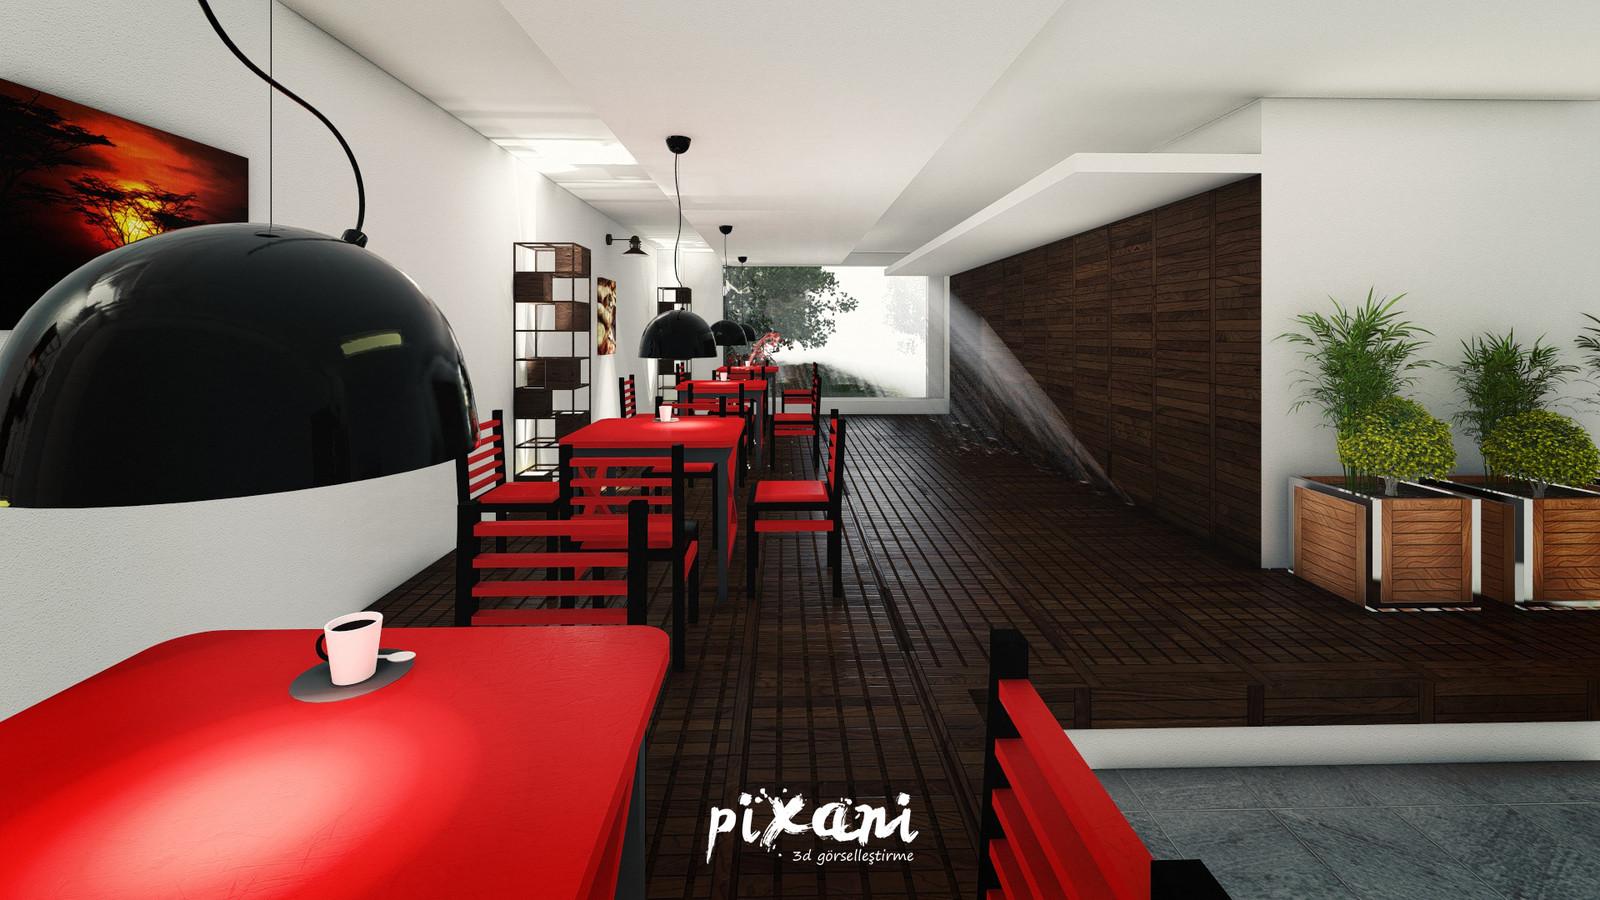 Second Dining Hall of Karebant  KAREBANT REFECTORY  designed by Serdar Çakmak Pixani 3D Visualization & Animation www.pix-ani.com